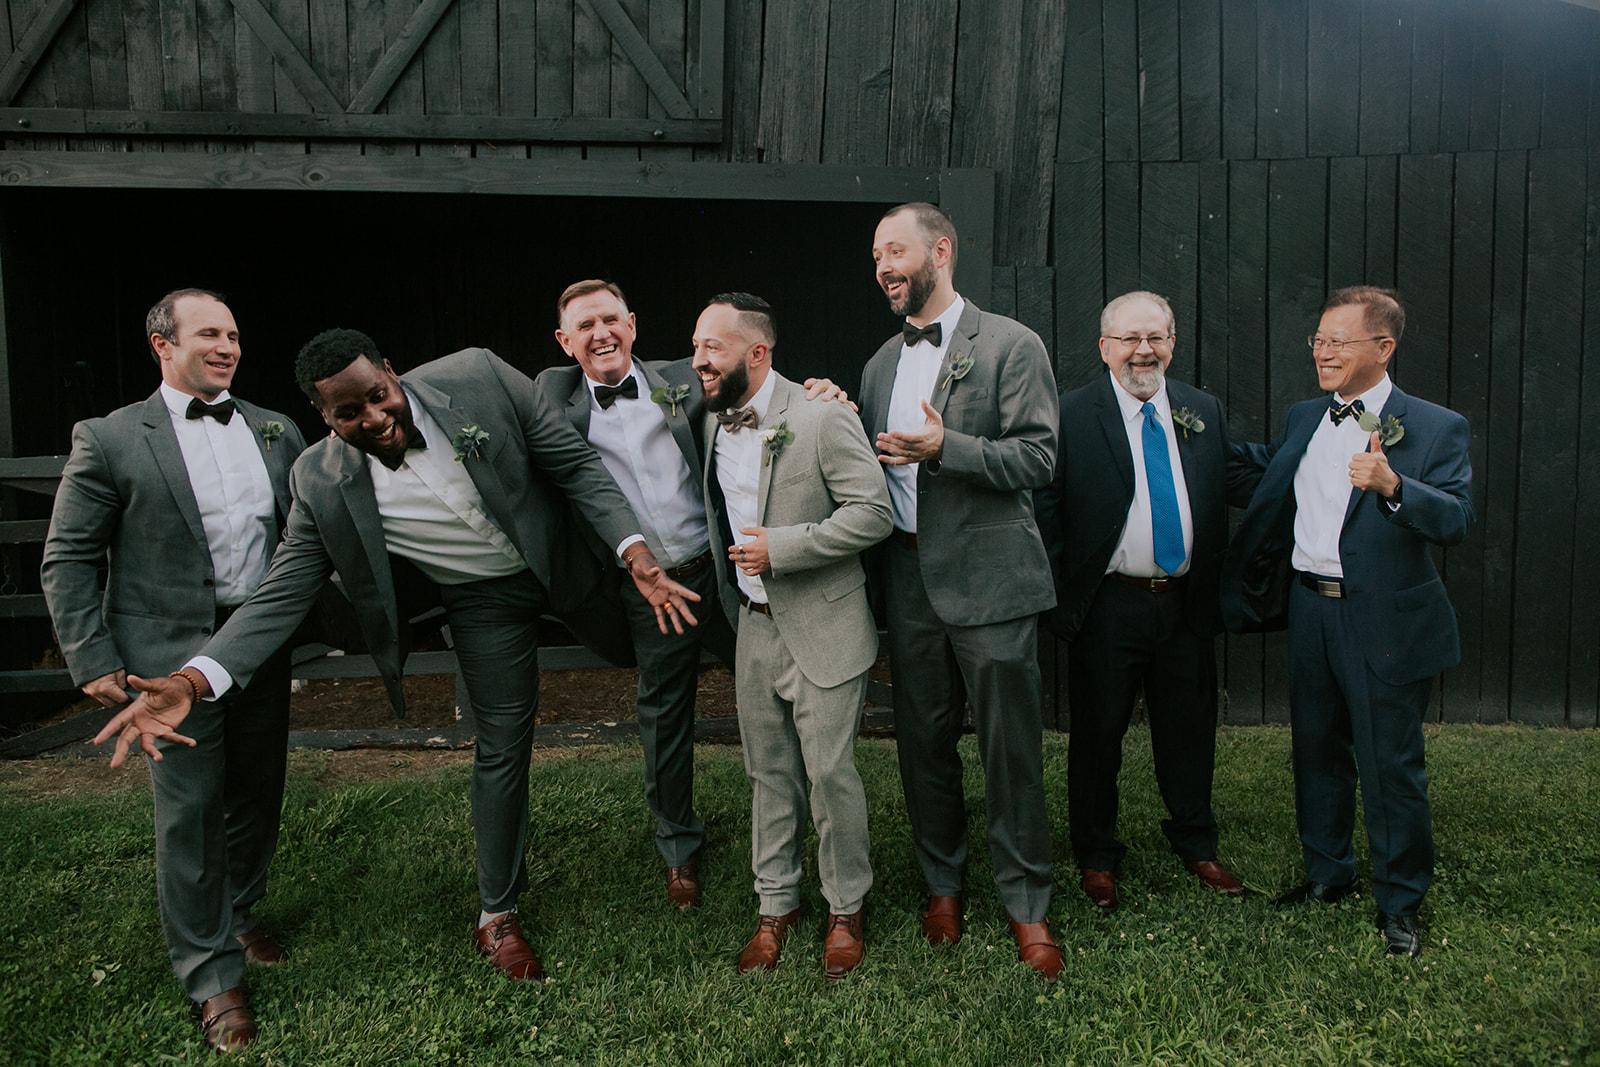 Groom and groomsmen: Summer Soiree at Cedarwood Weddings featured on Nashville Bride Guide